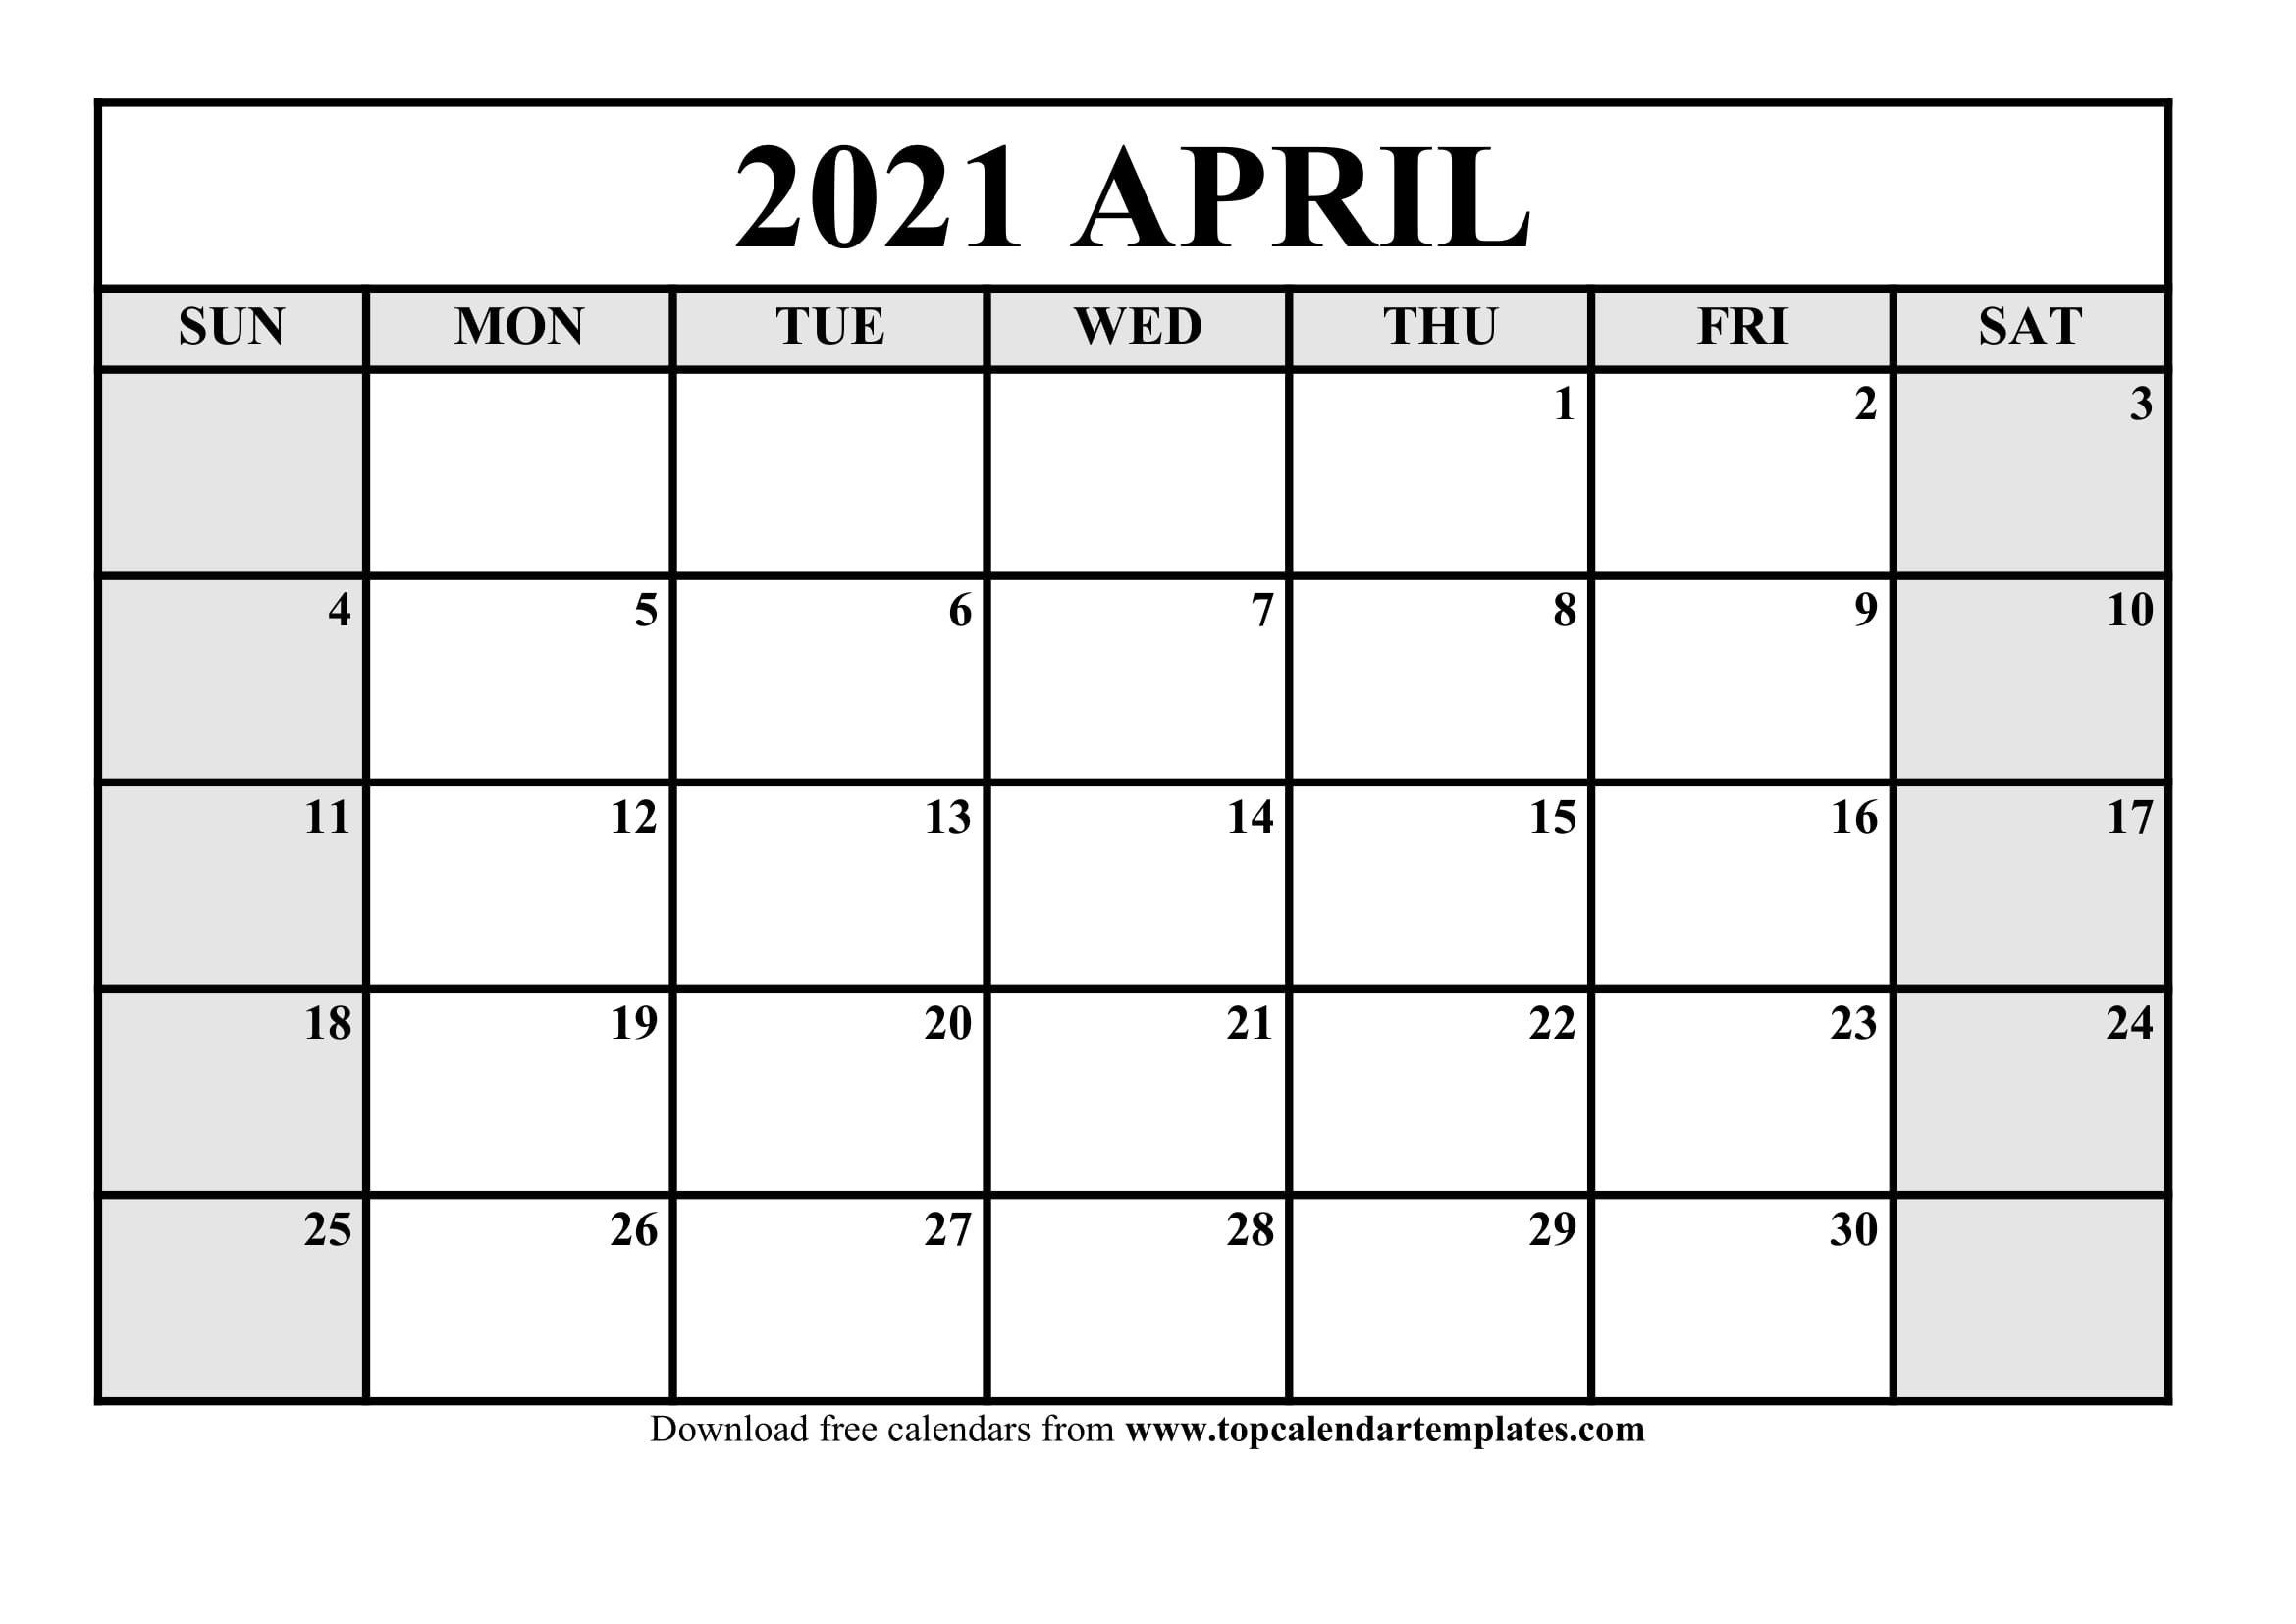 Free April 2021 Calendar Printable - Monthly Template Online Calander I Can Edit